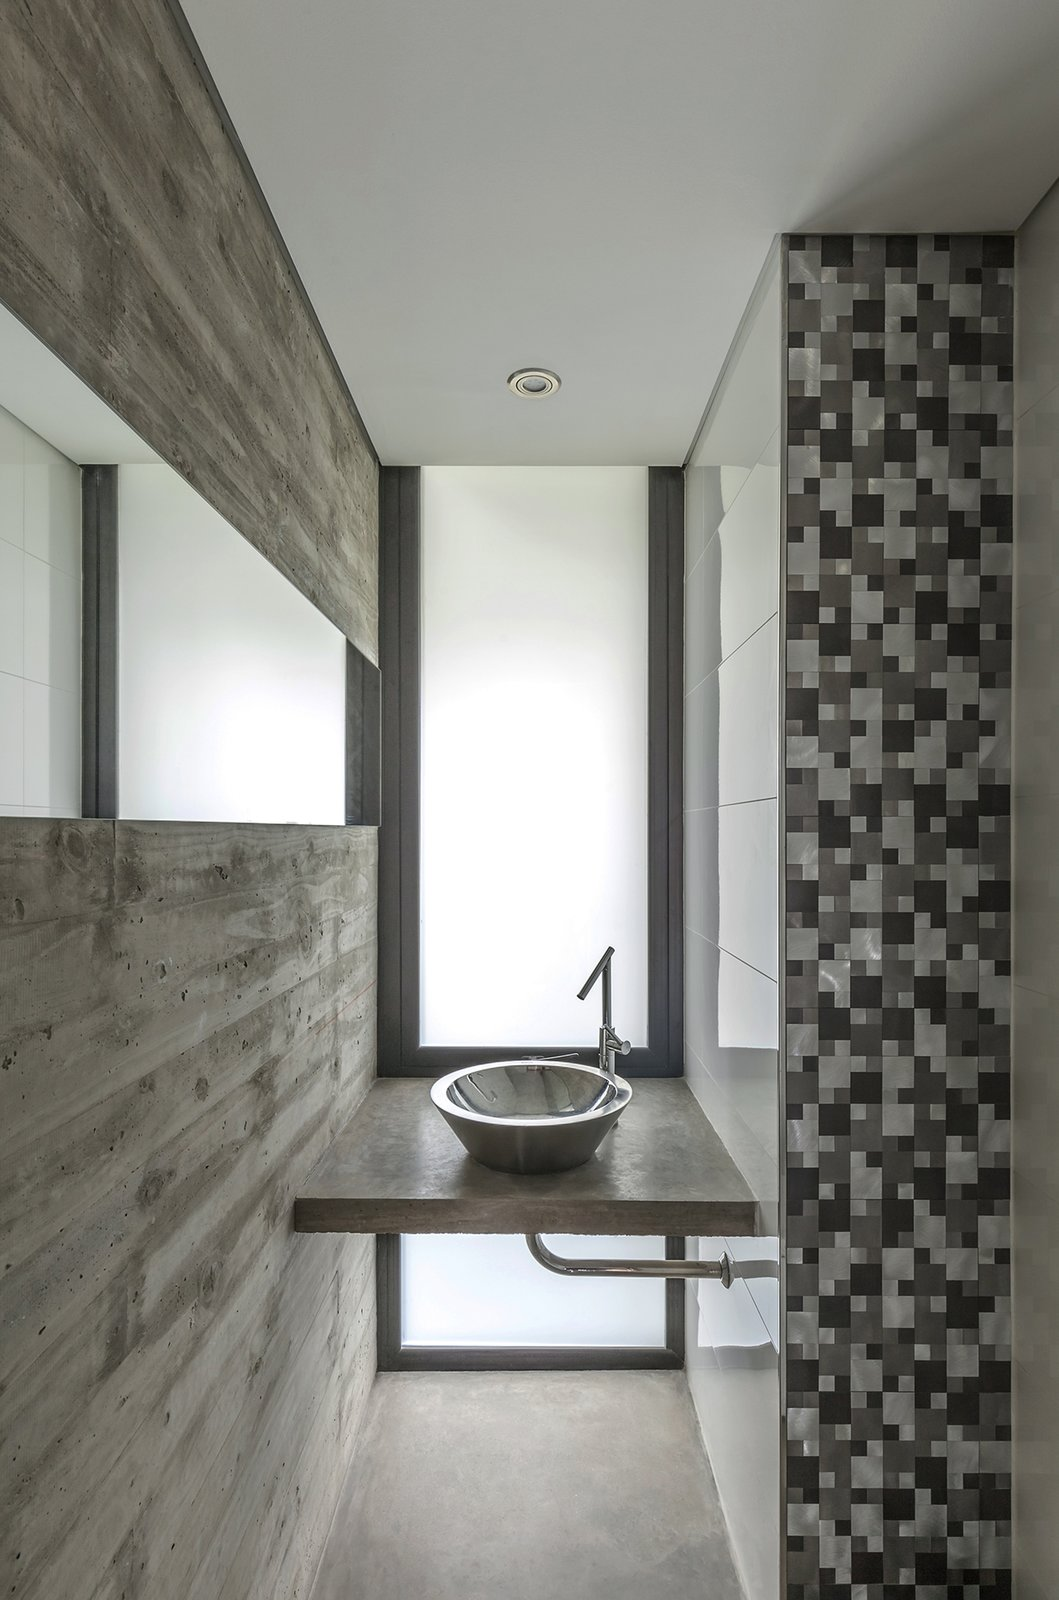 Bath, Concrete, Concrete, Drop In, Glass Tile, Two Piece, and Accent Aranzazu House - Besonías Almeida arquitectos  Best Bath Accent Glass Tile Photos from Aranzazu House